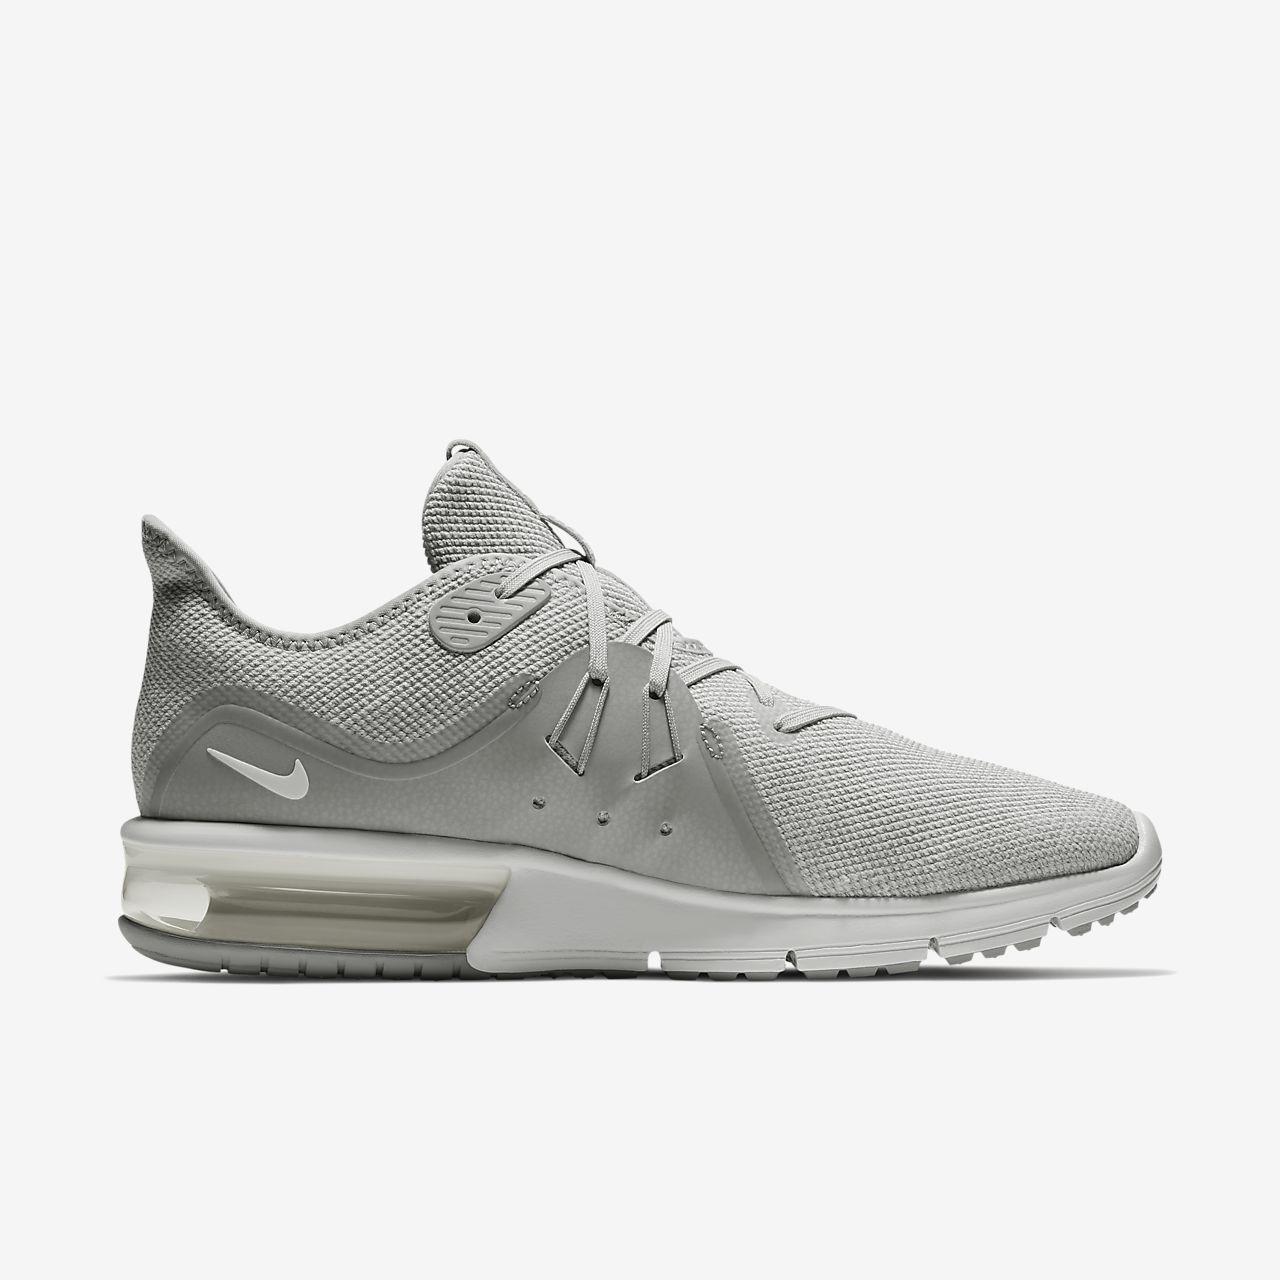 Calzado para hombre Nike Air Max Sequent 3